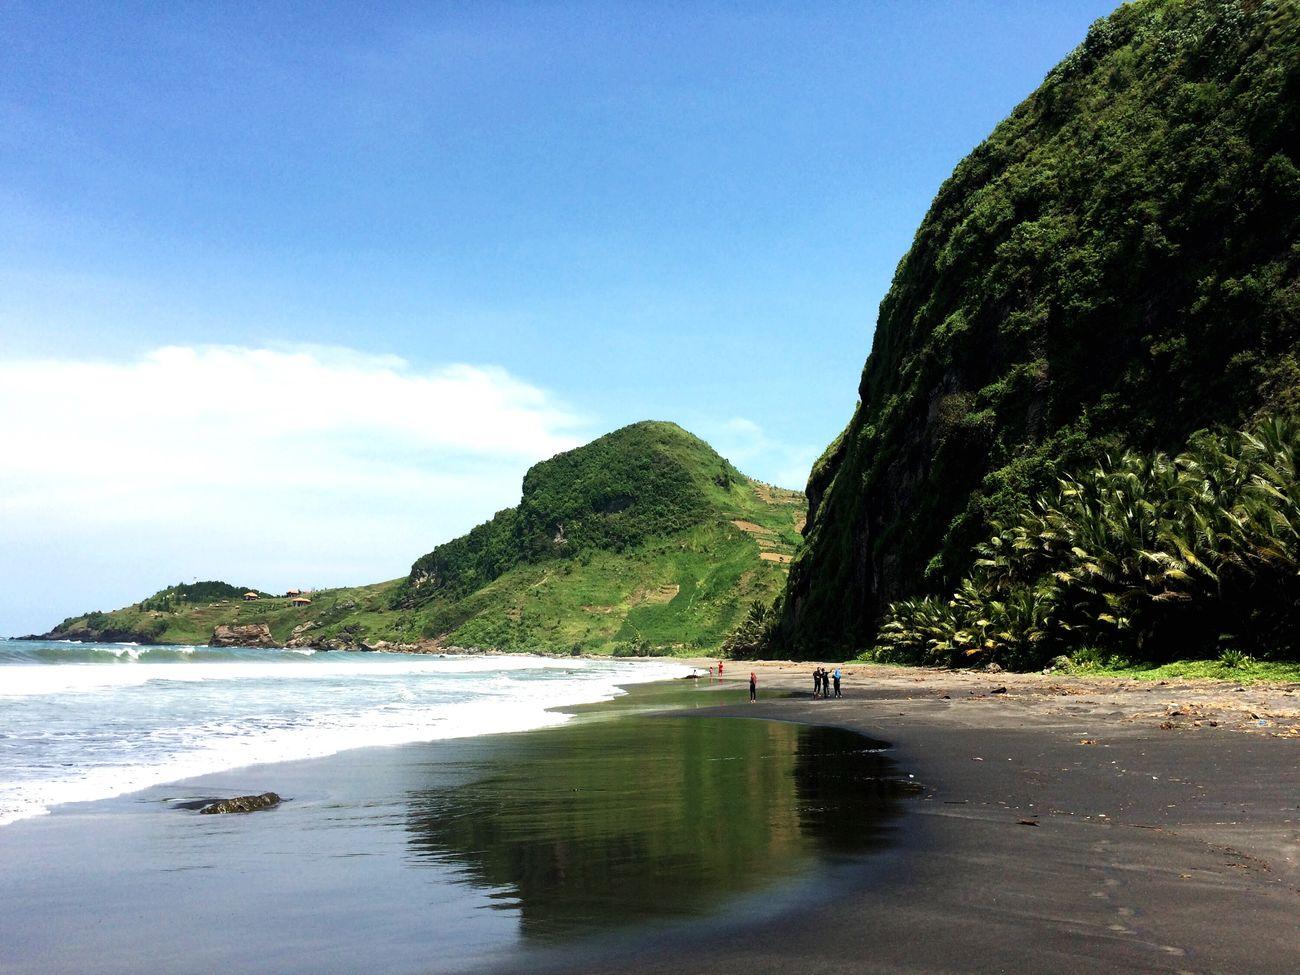 Lampon beach